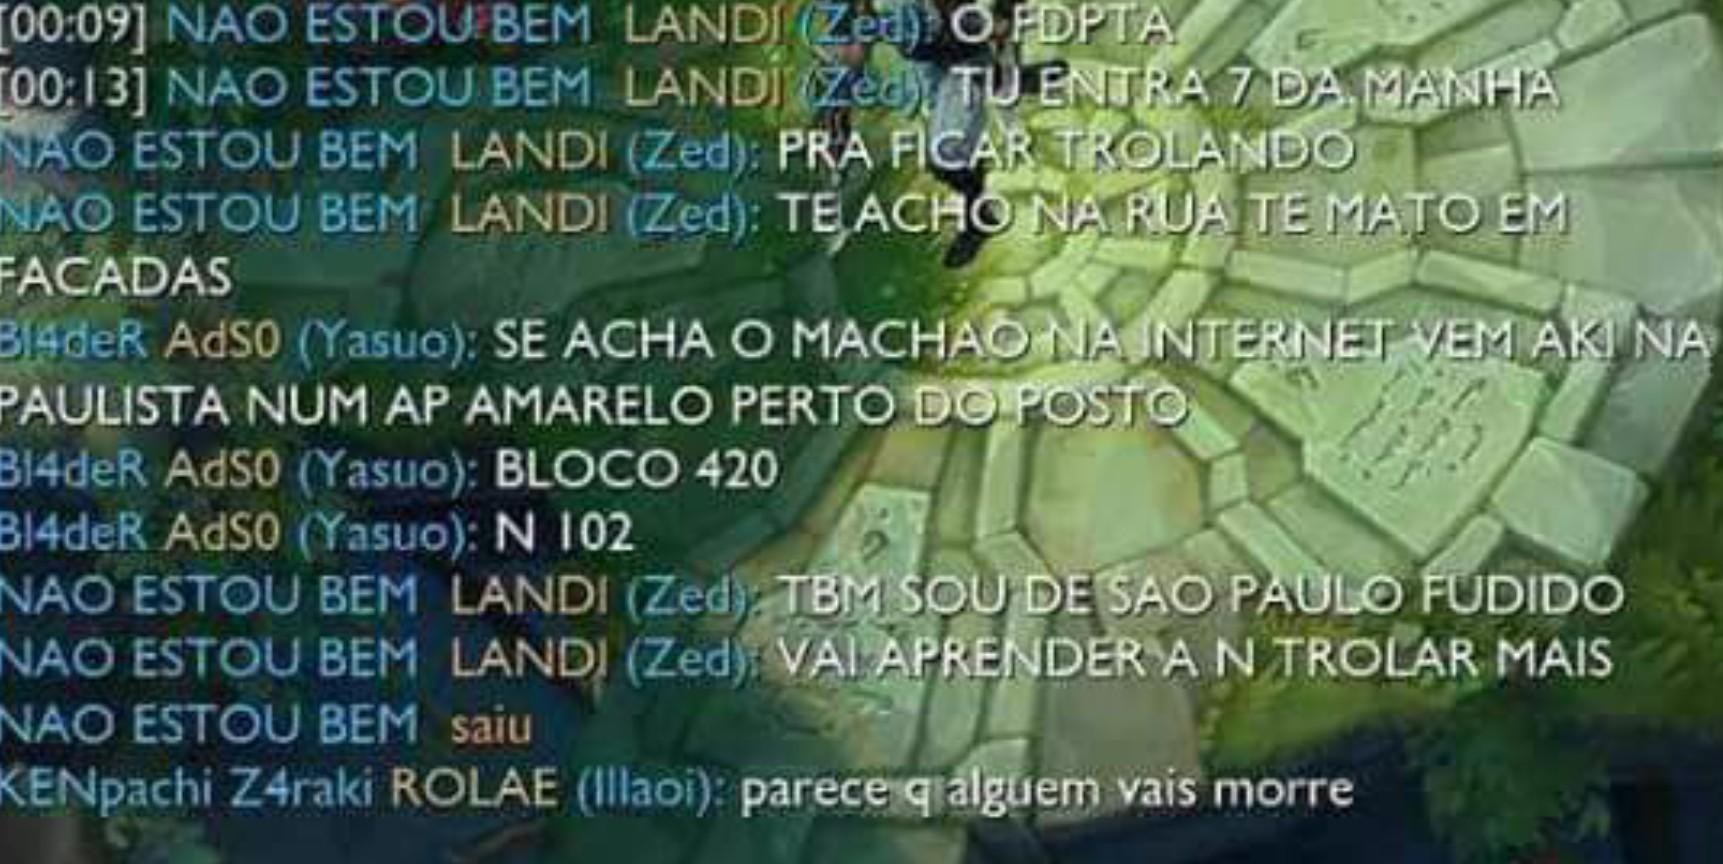 SE ACHA O MACHAO NA INTERNET - meme